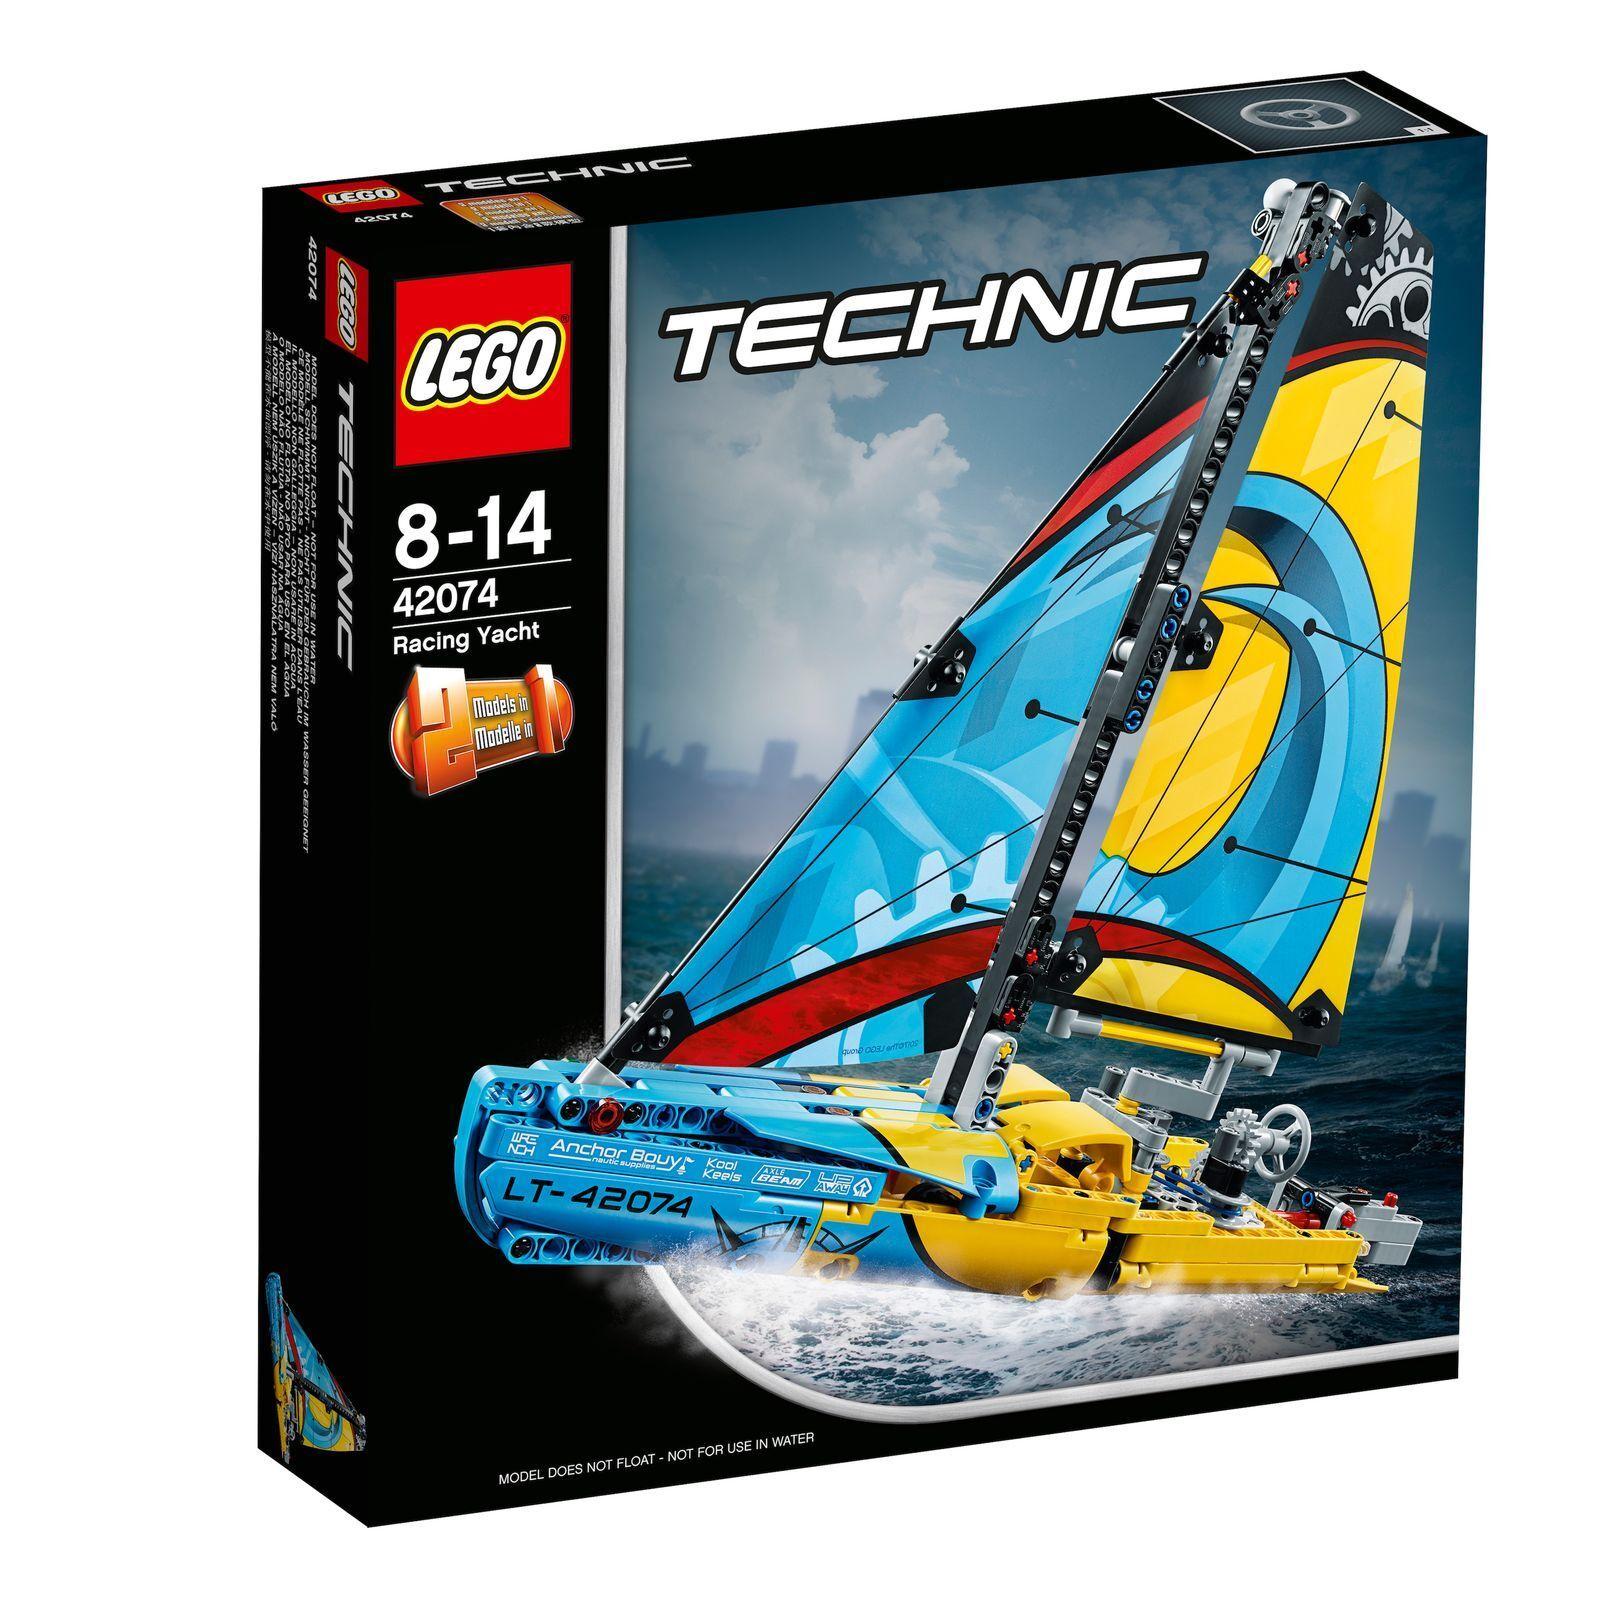 LEGO ® Technic 42074 rennyacht NUOVO OVP _ Racing Yacht NEW MISB NRFB